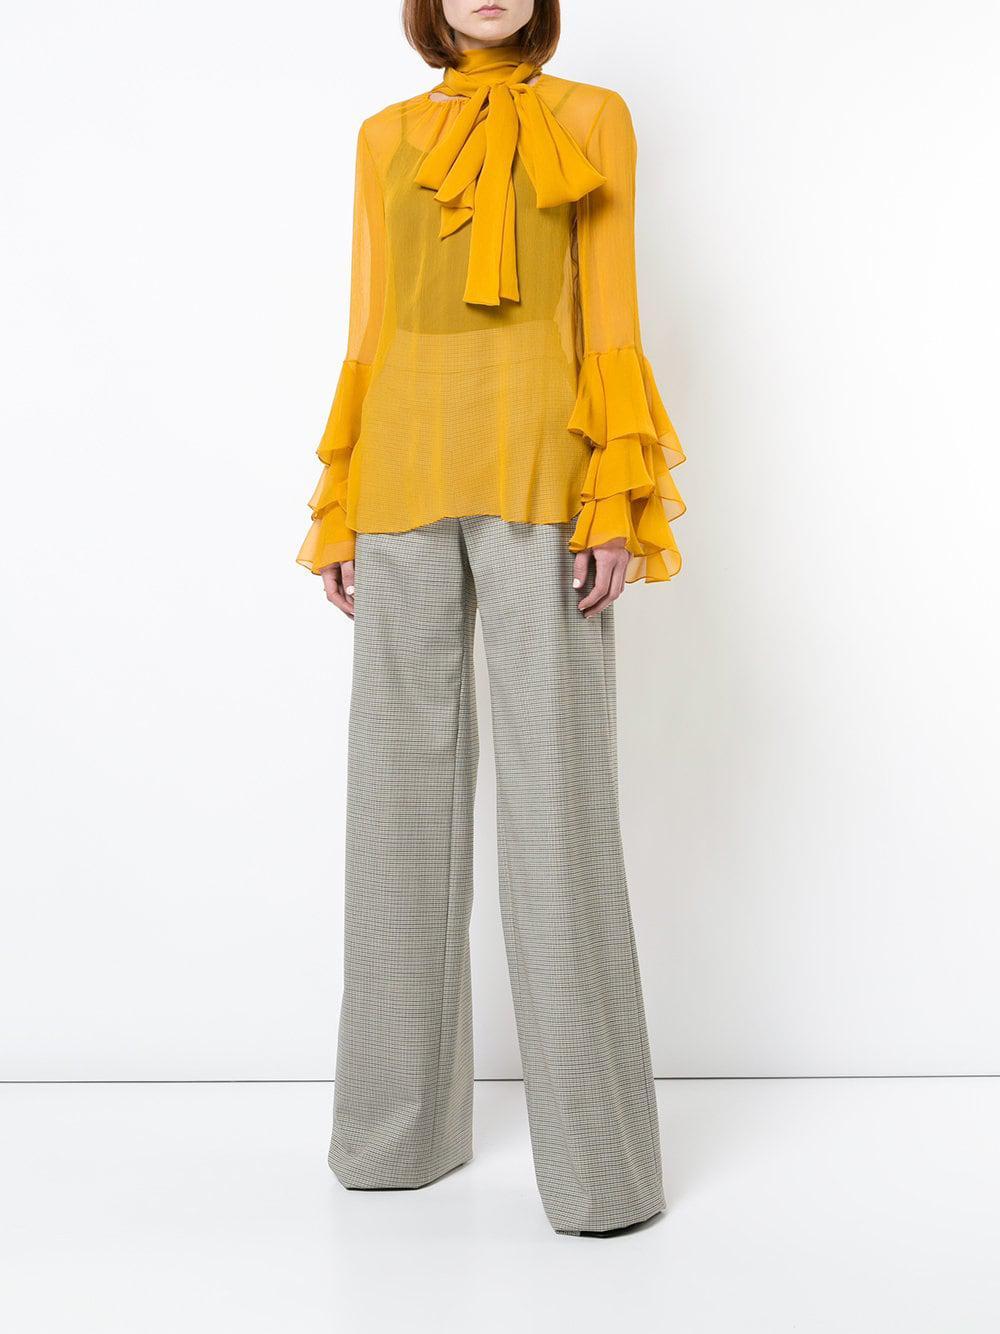 7c832aff97b30b Lyst - Prabal Gurung Ruffle Cuff Bow Tie Blouse in Yellow - Save 40%